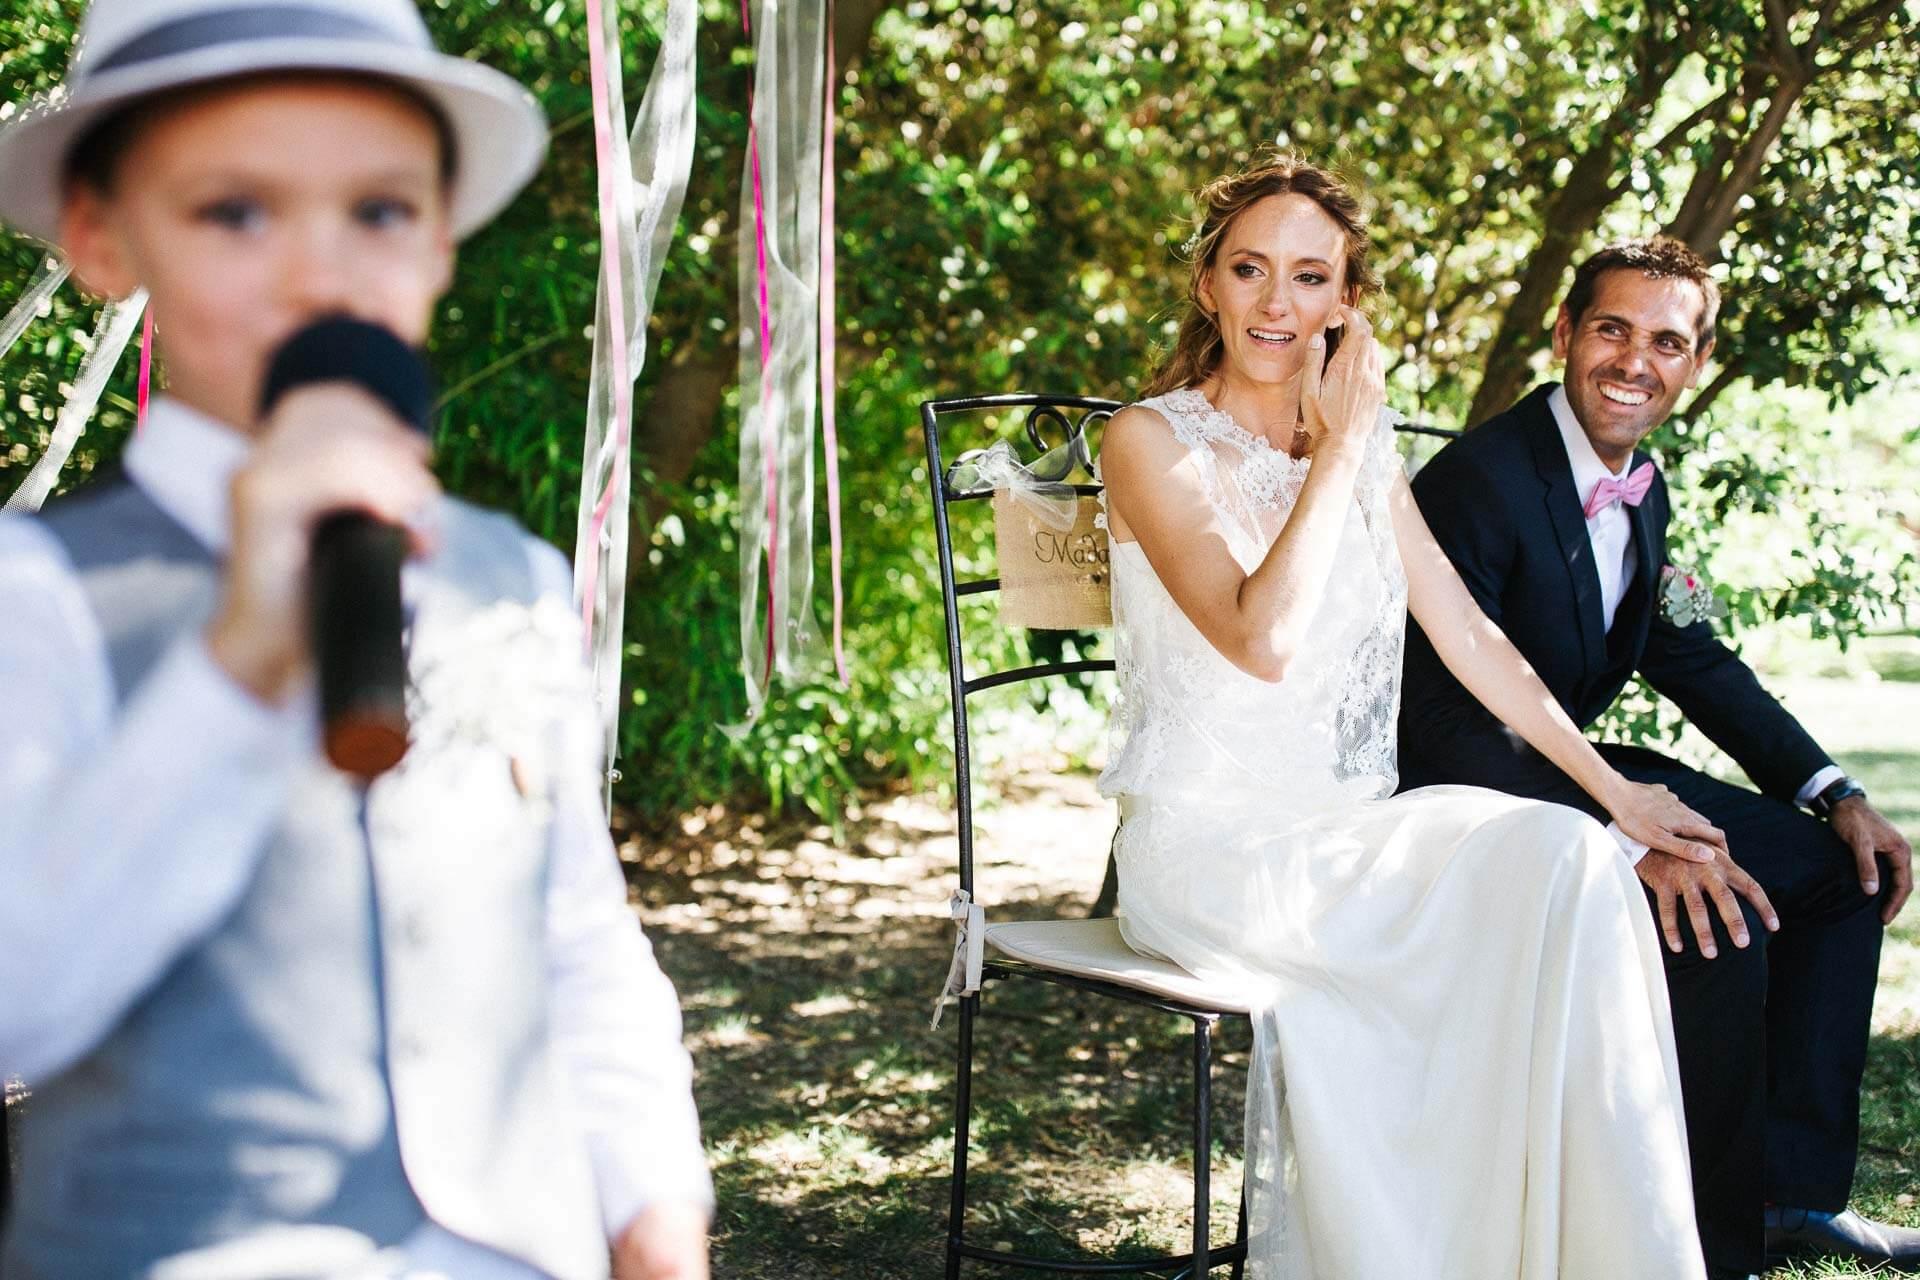 photographe-mariage-aix-en-provence-stephanie-jerome-13